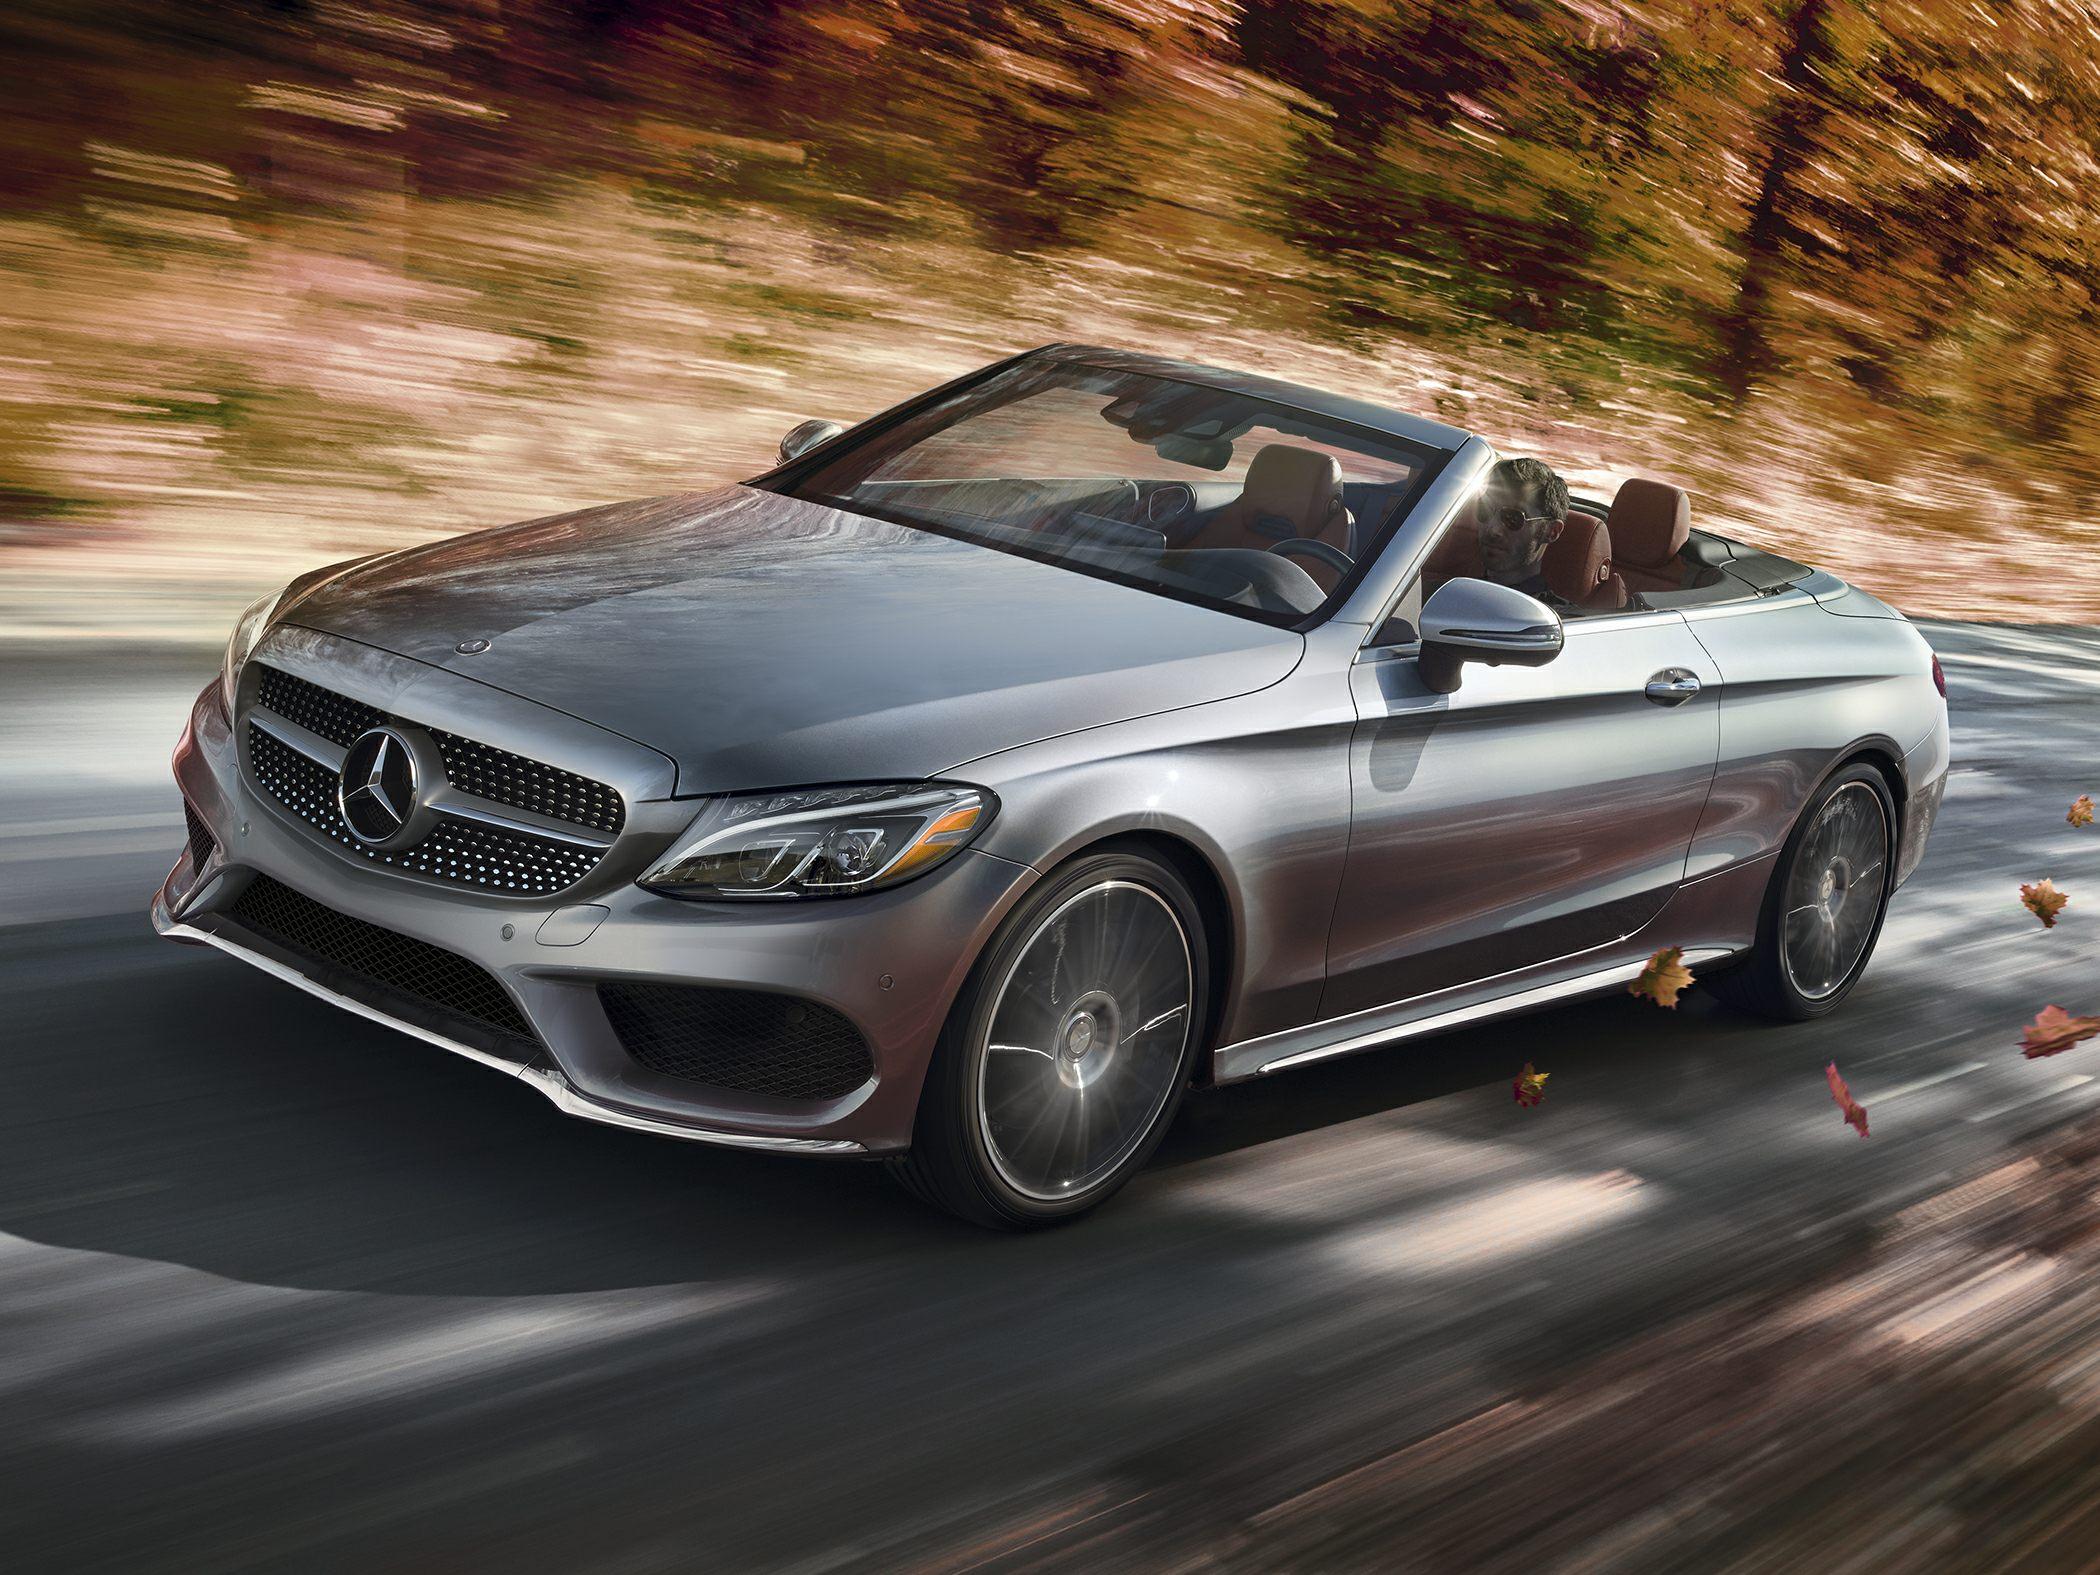 2018 mercedes benz c class deals prices incentives for Mercedes benz c class offers